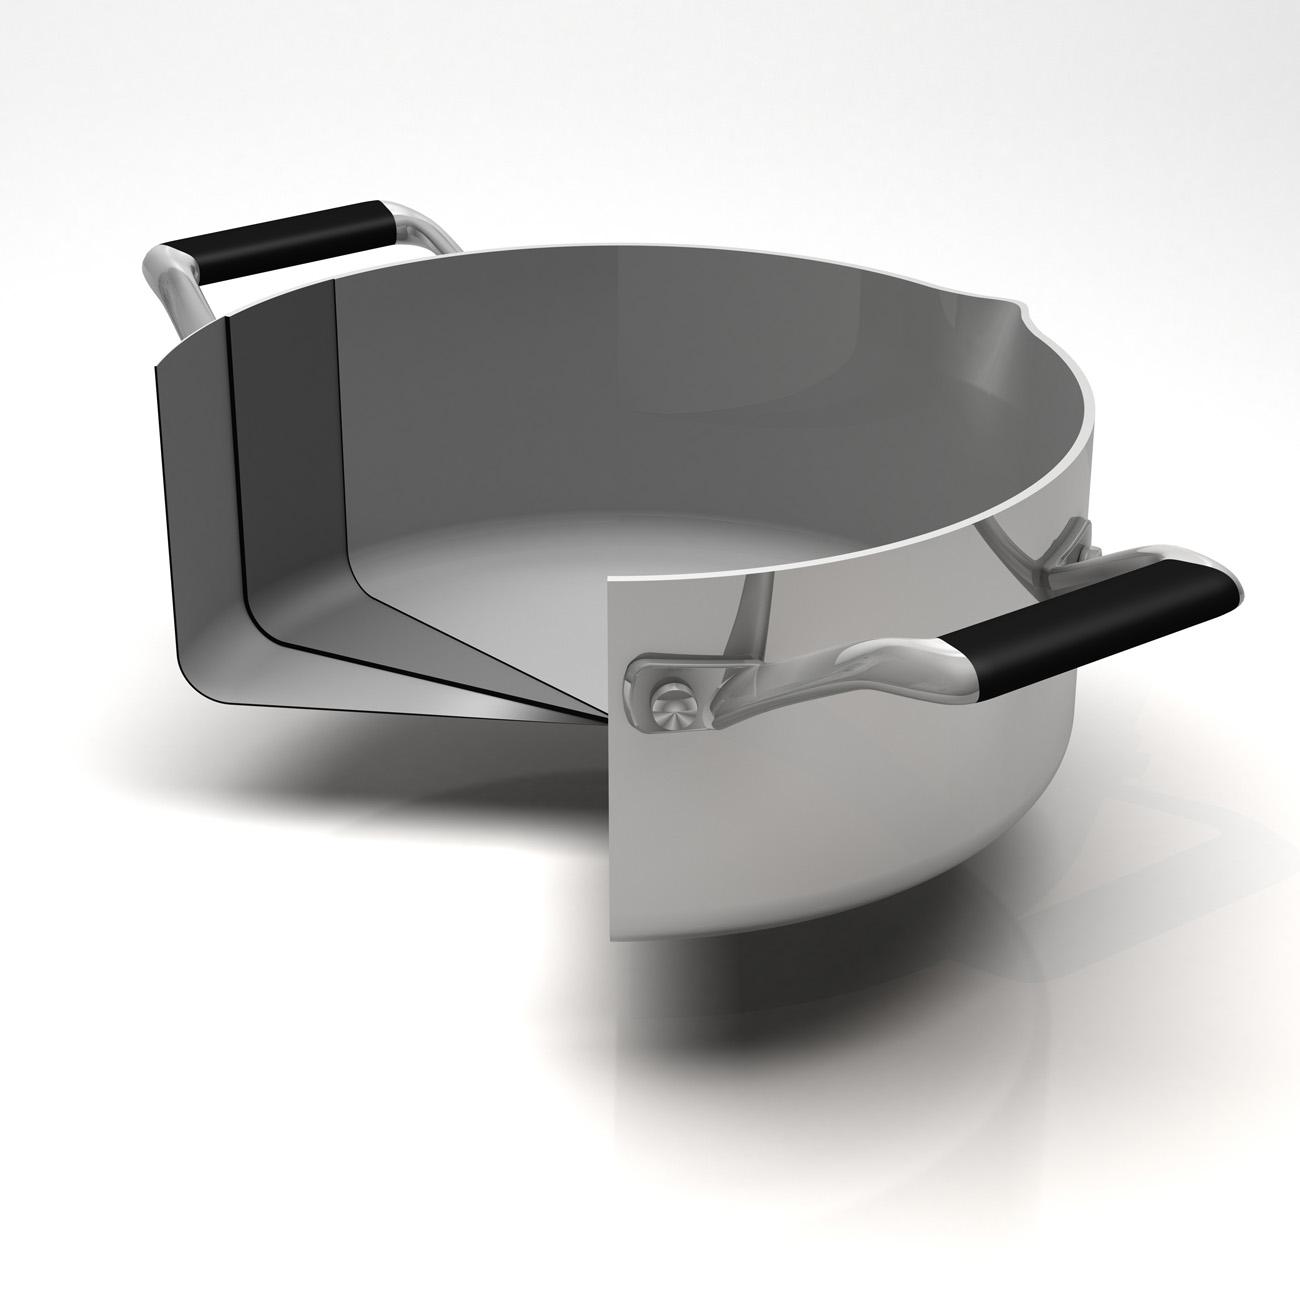 CUCINO-pot4